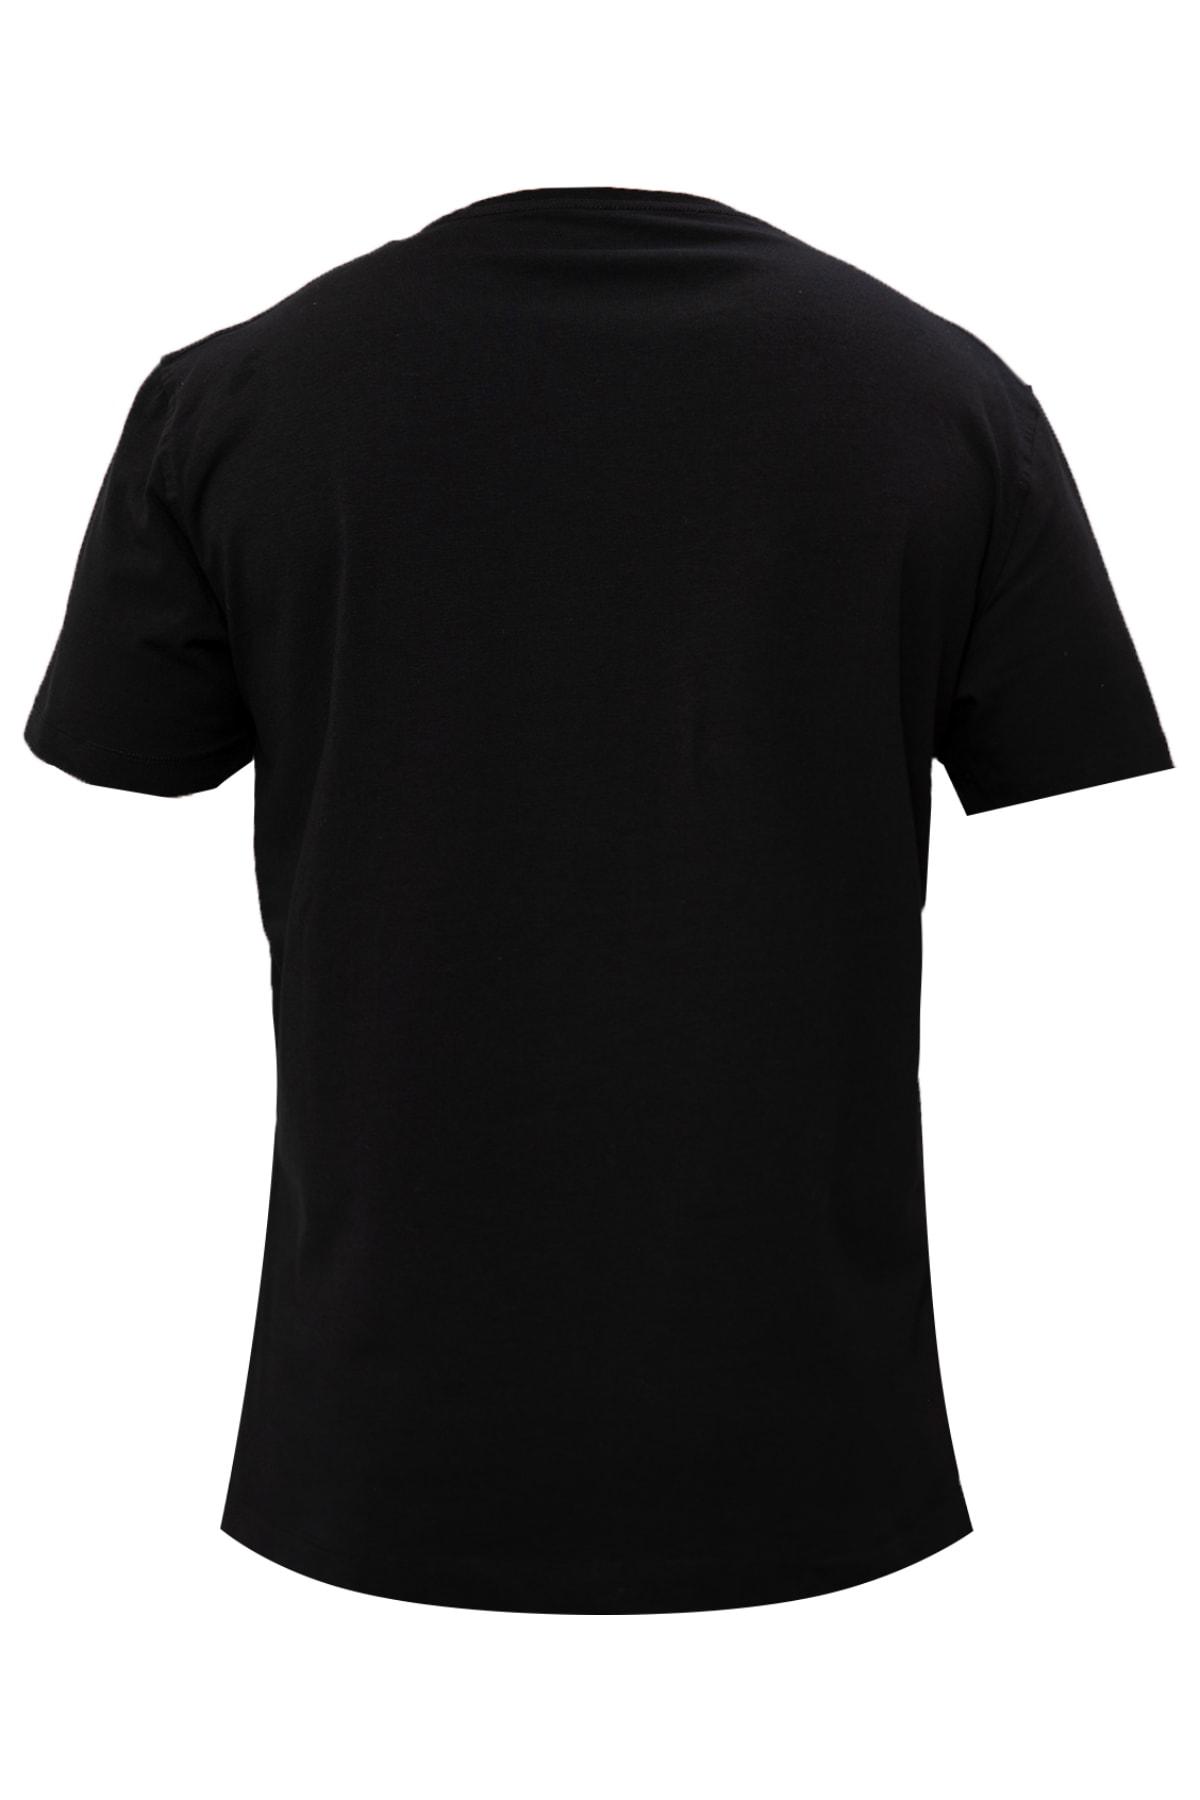 Lufian Nefer Modern Grafik T- Shirt Siyah 1